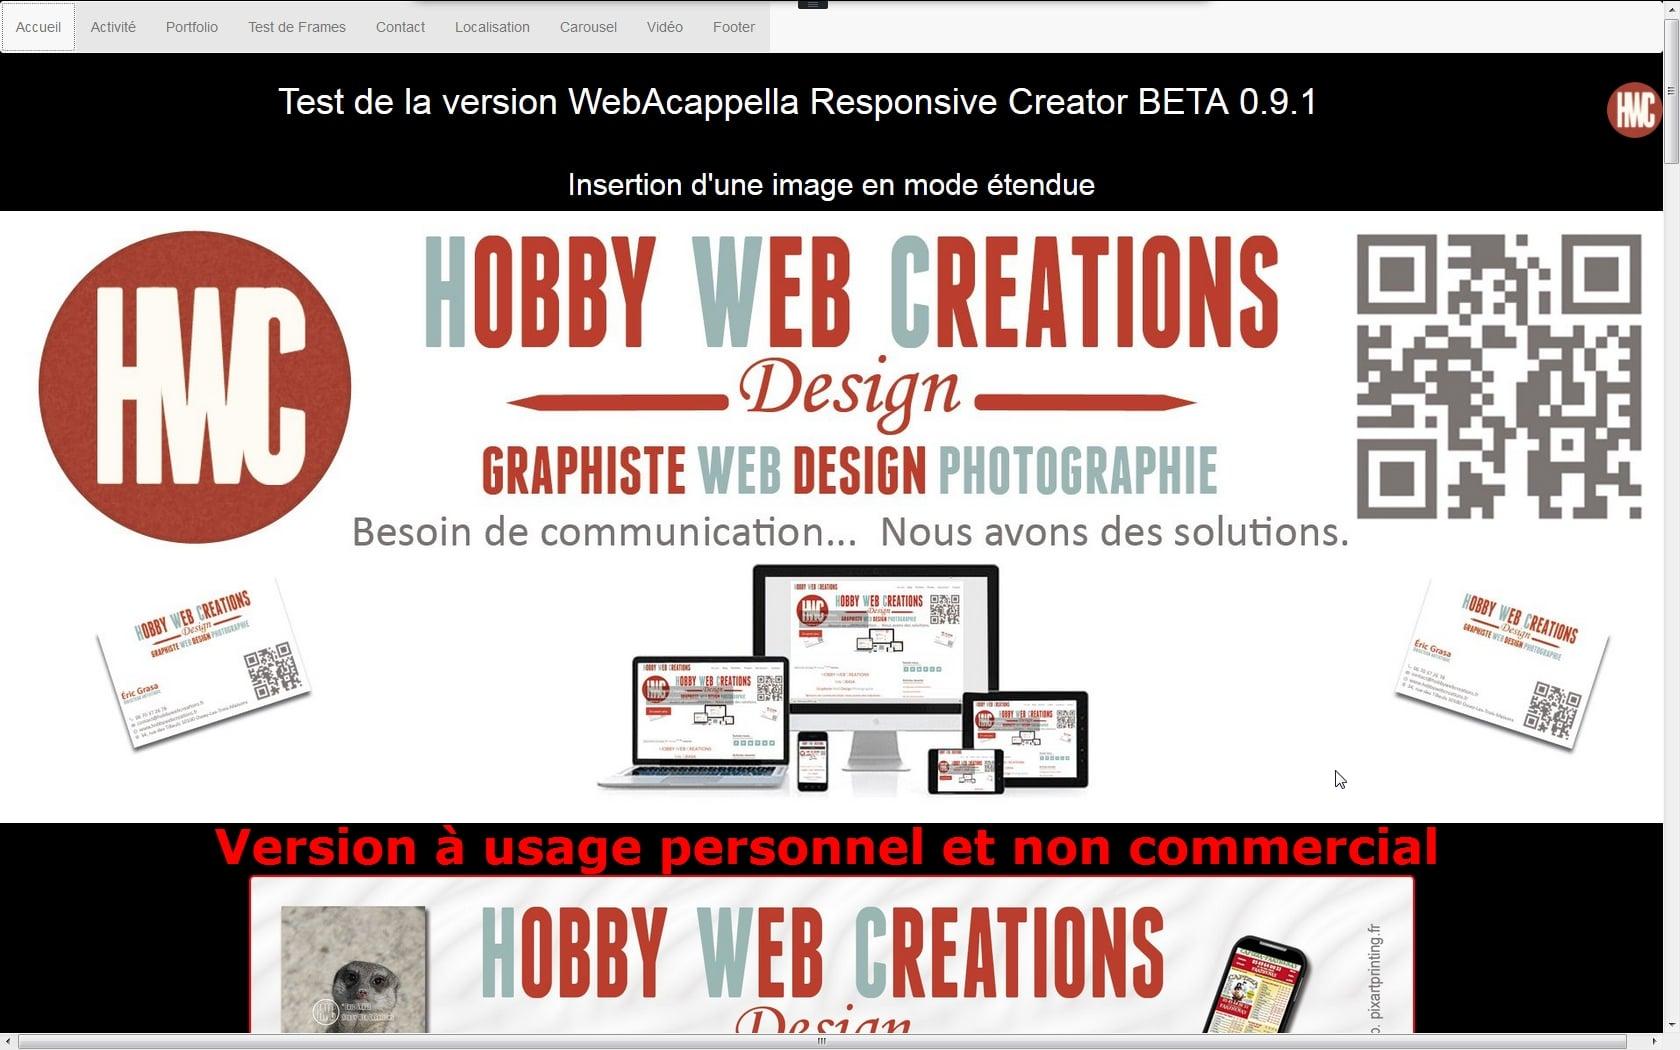 Webacappella responsive creator beta 0 9 1 1 hwc for Copie ecran